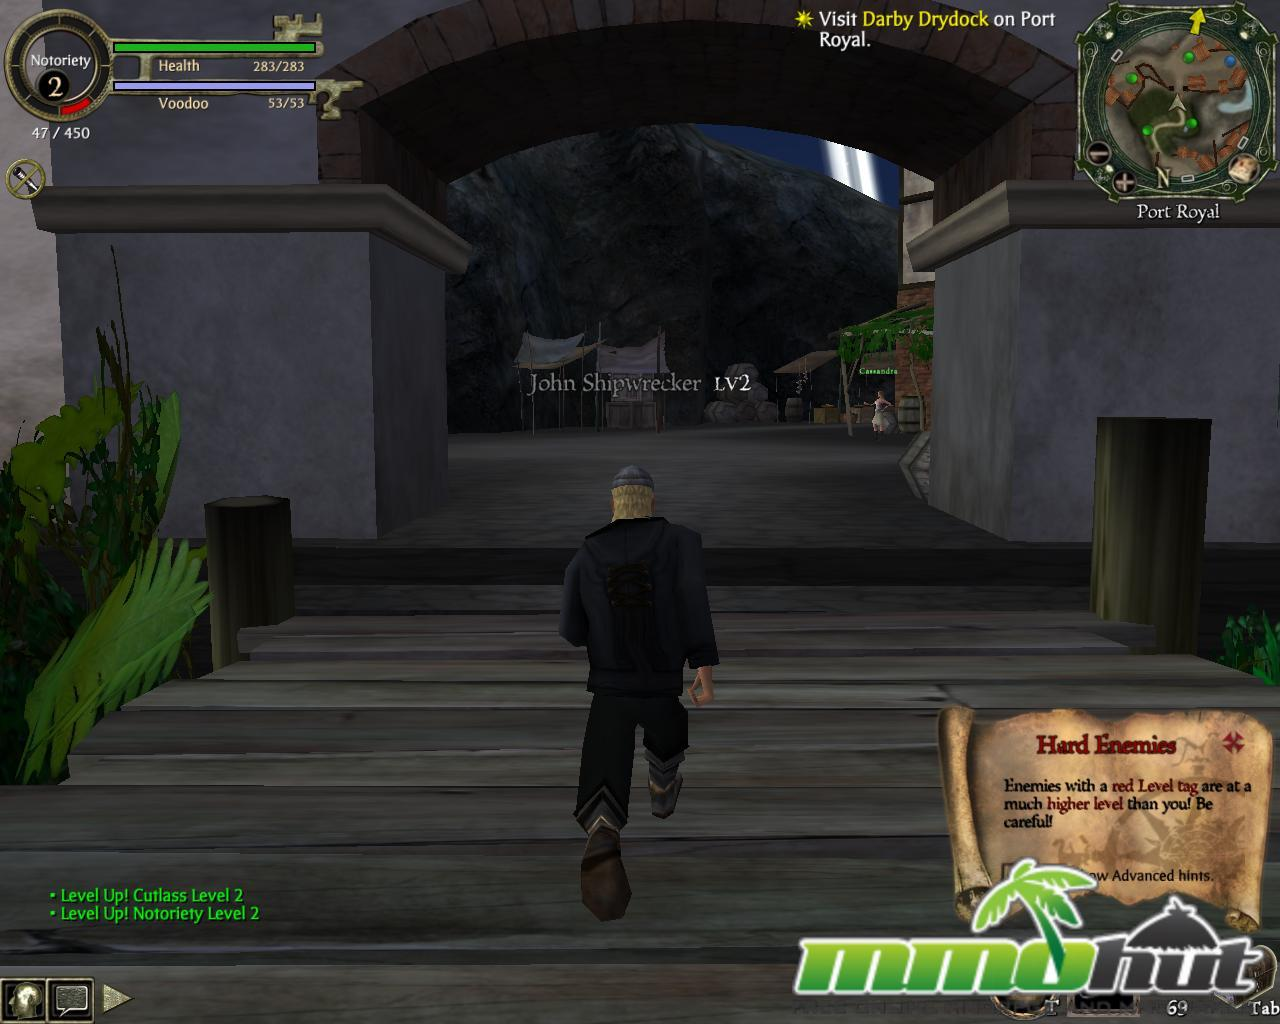 Pirates of the Carribbean Online Bridge Screenshot